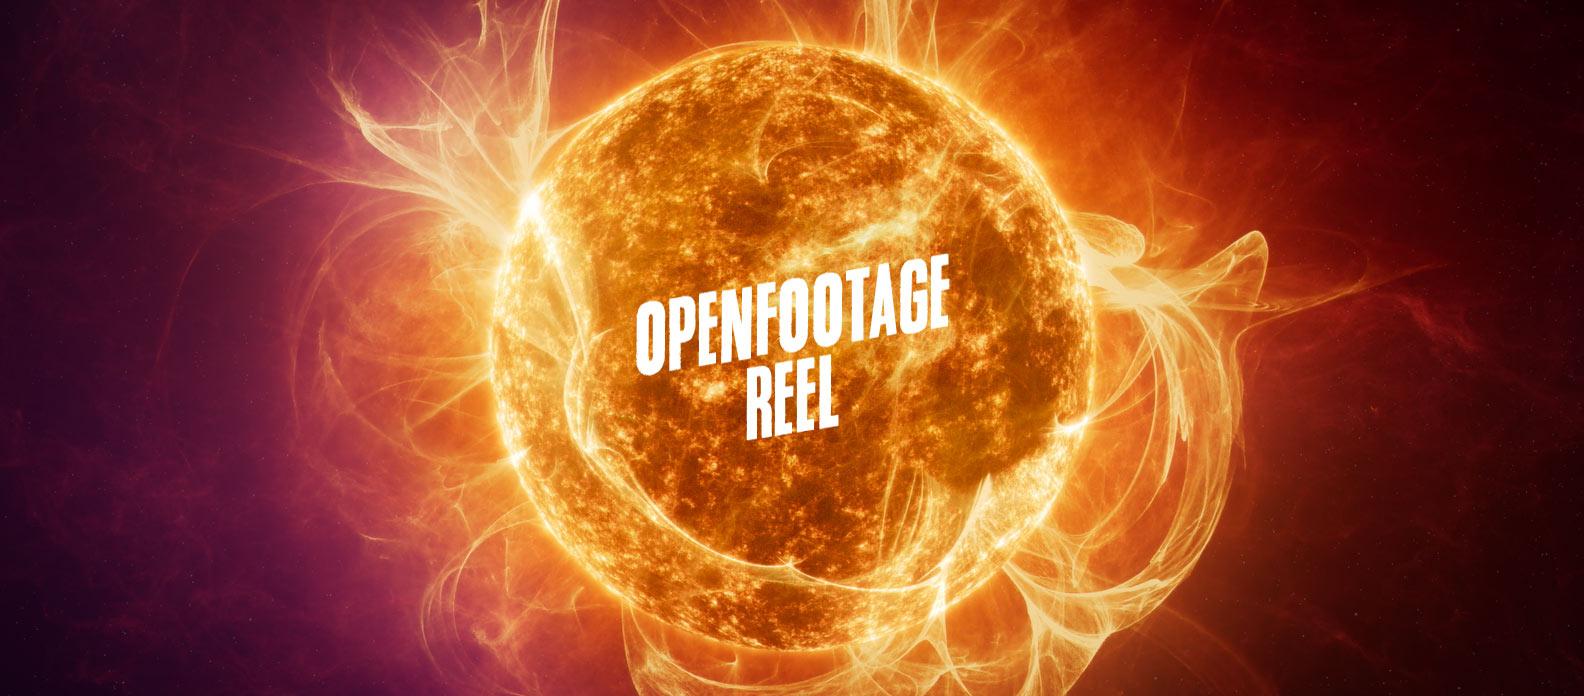 Openfootage